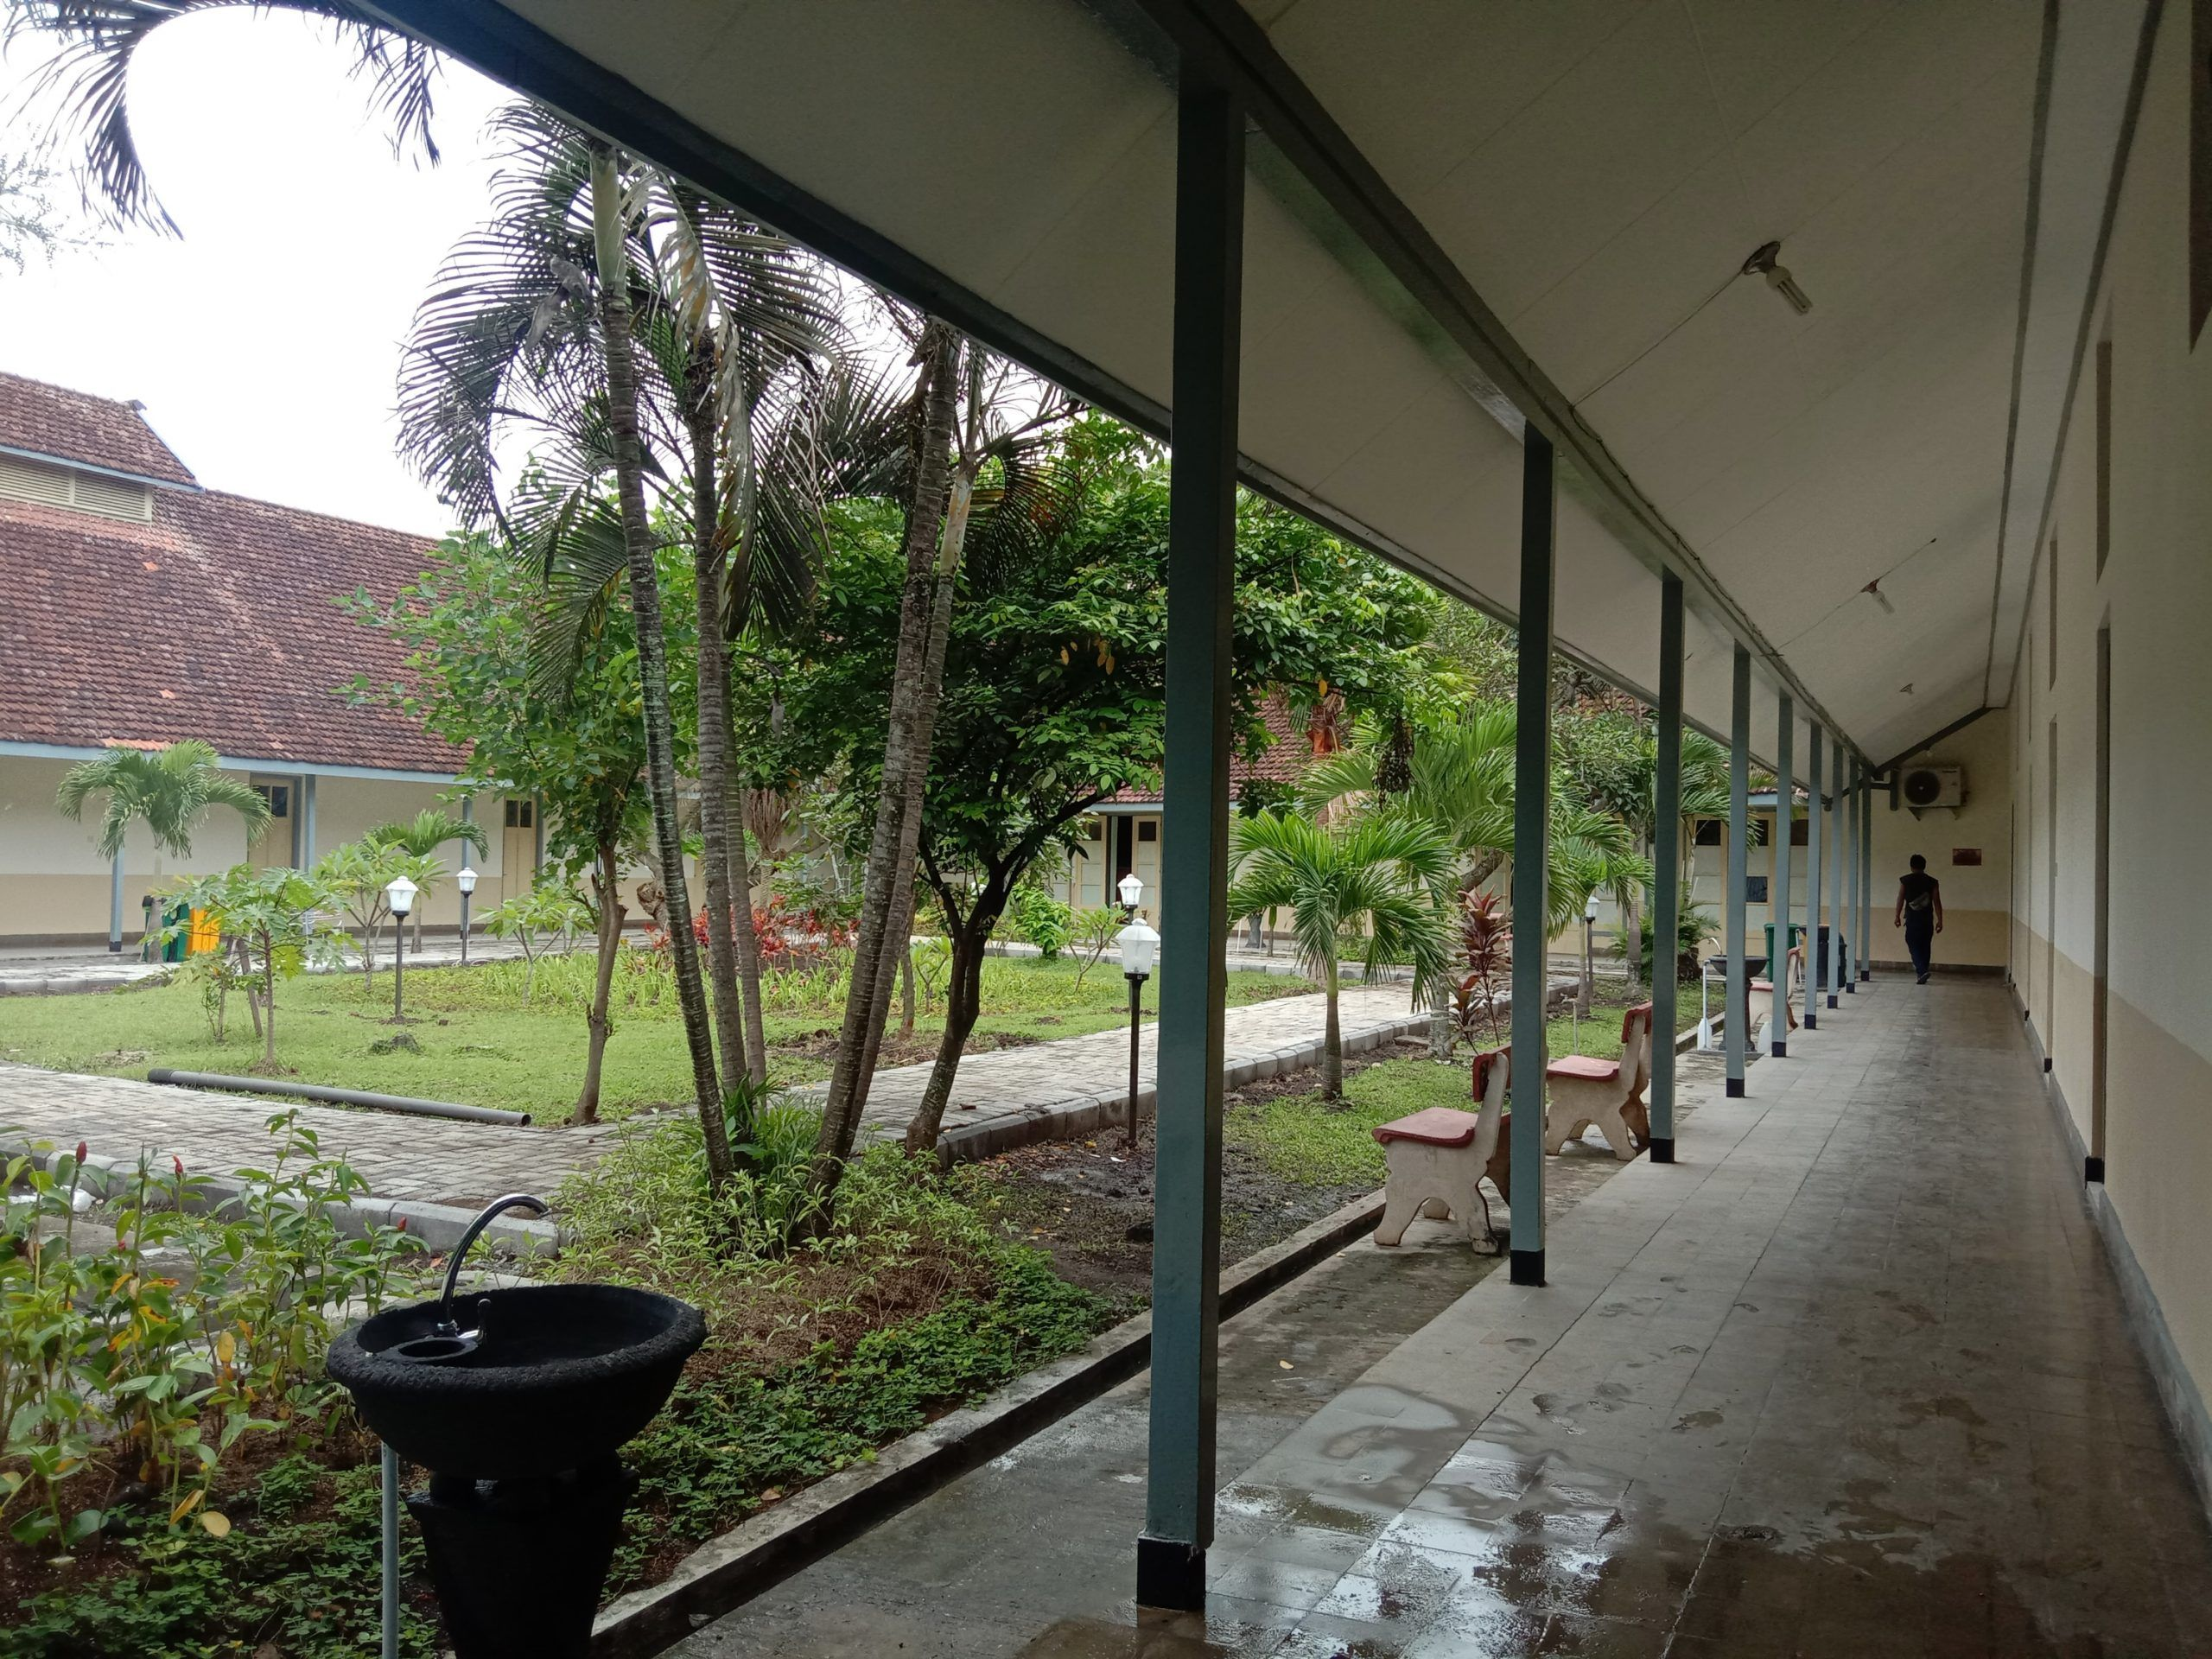 Fasilitas RS Lapangan Kota Malang: UGD, Jogging Track, hingga Karaoke